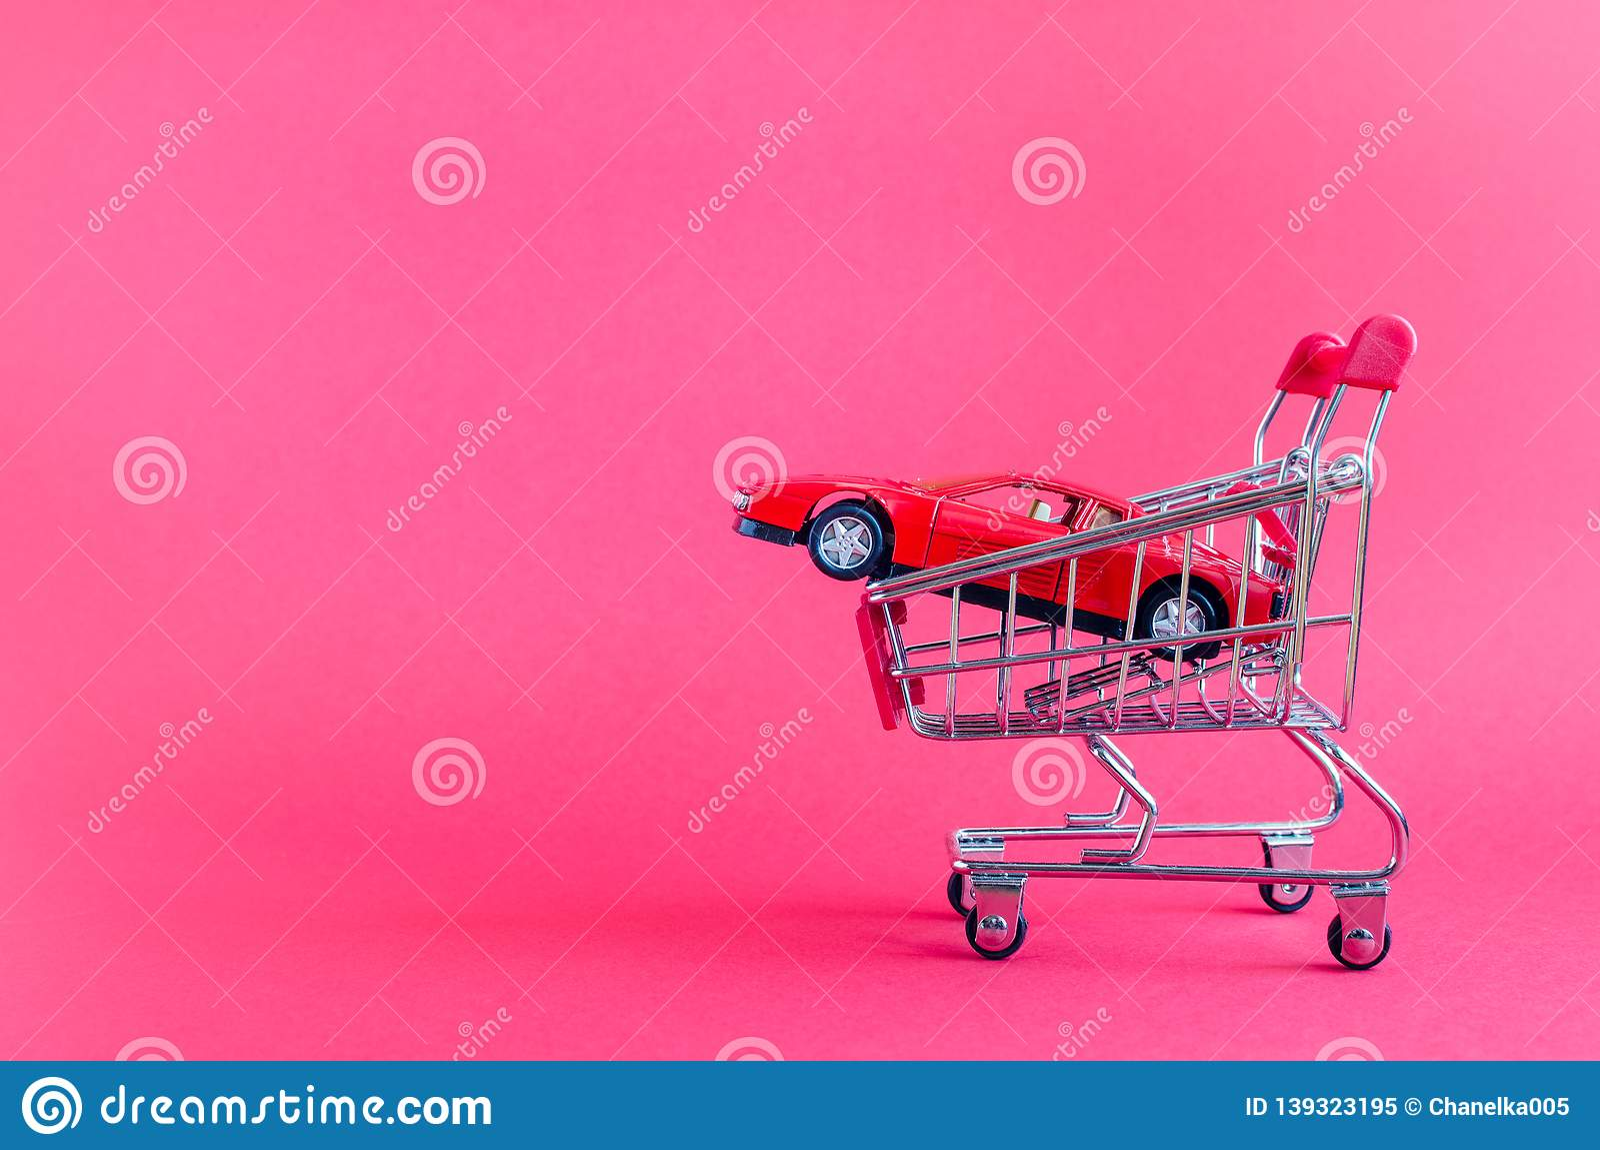 Car shopping, new car in a shopping cart